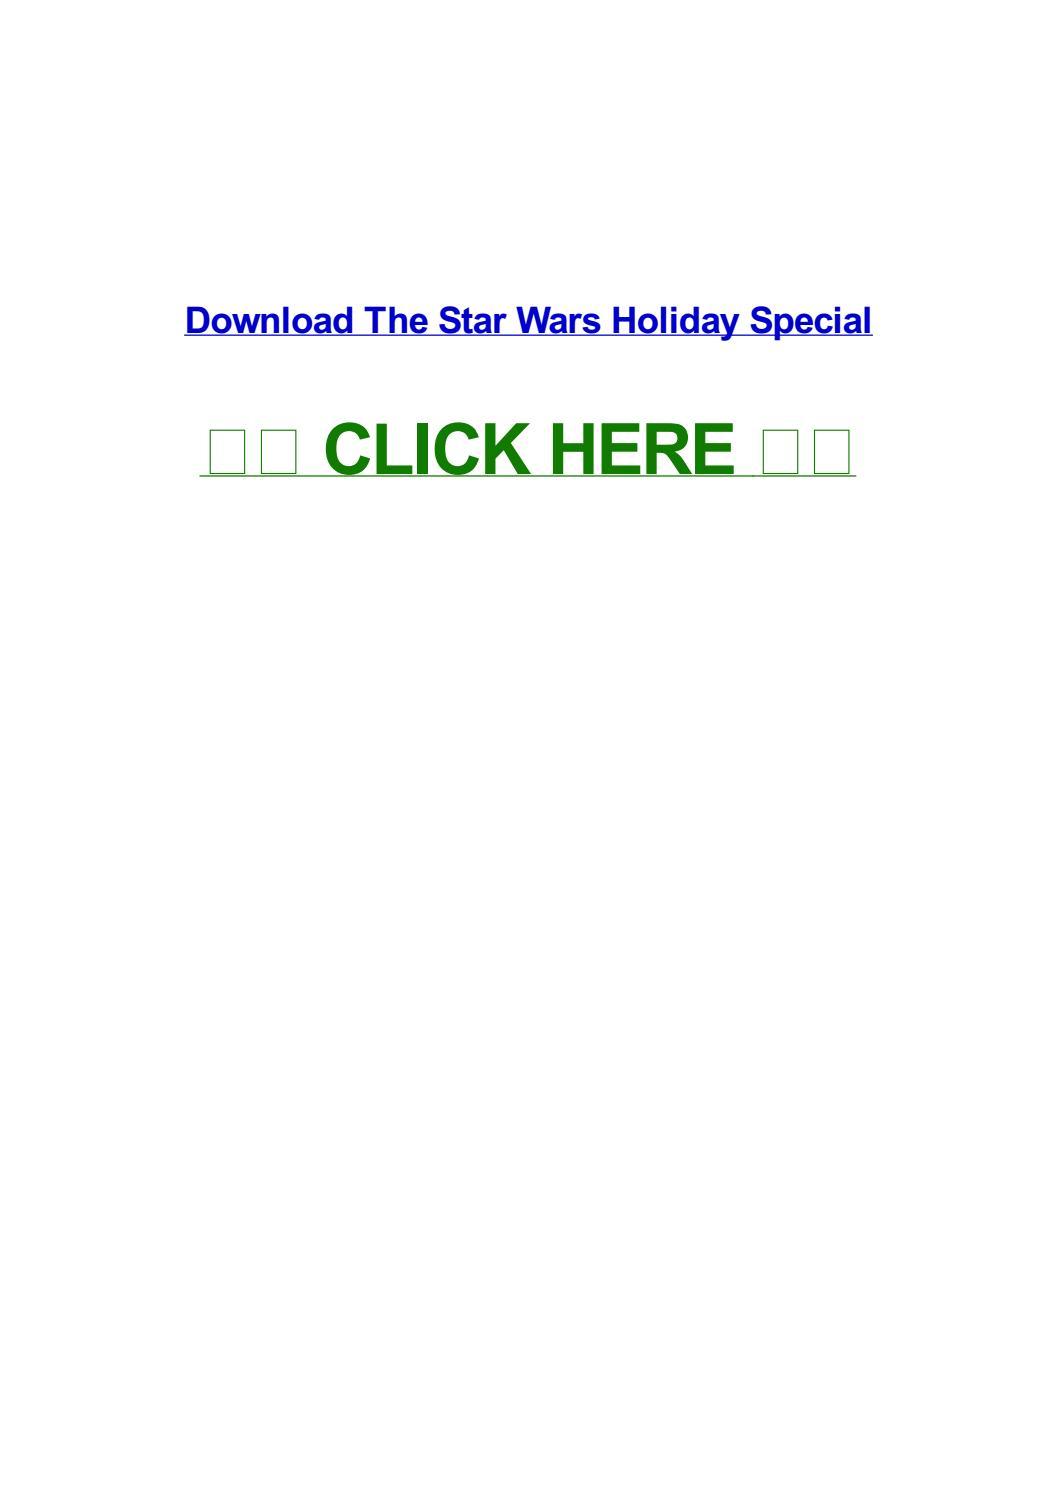 the star wars holiday special download legendado